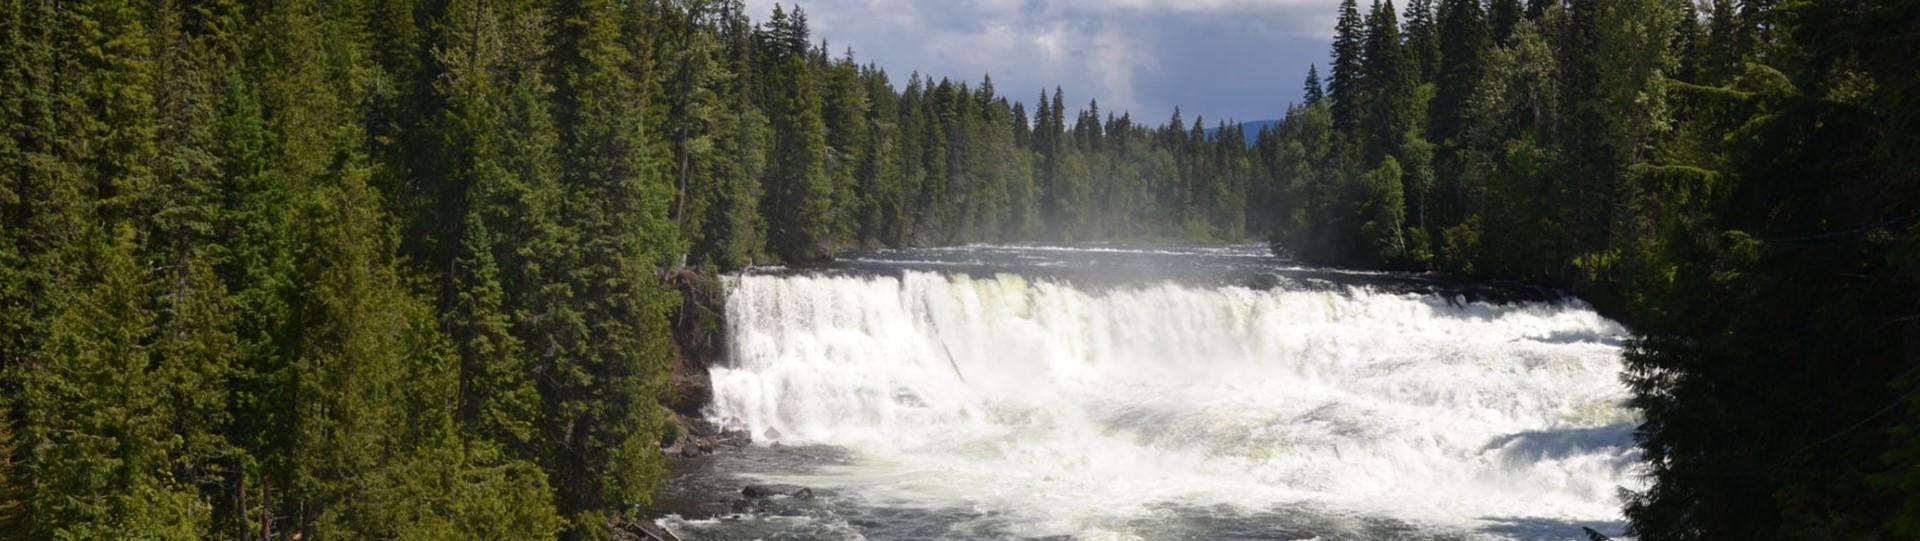 Reisverslag West Canada